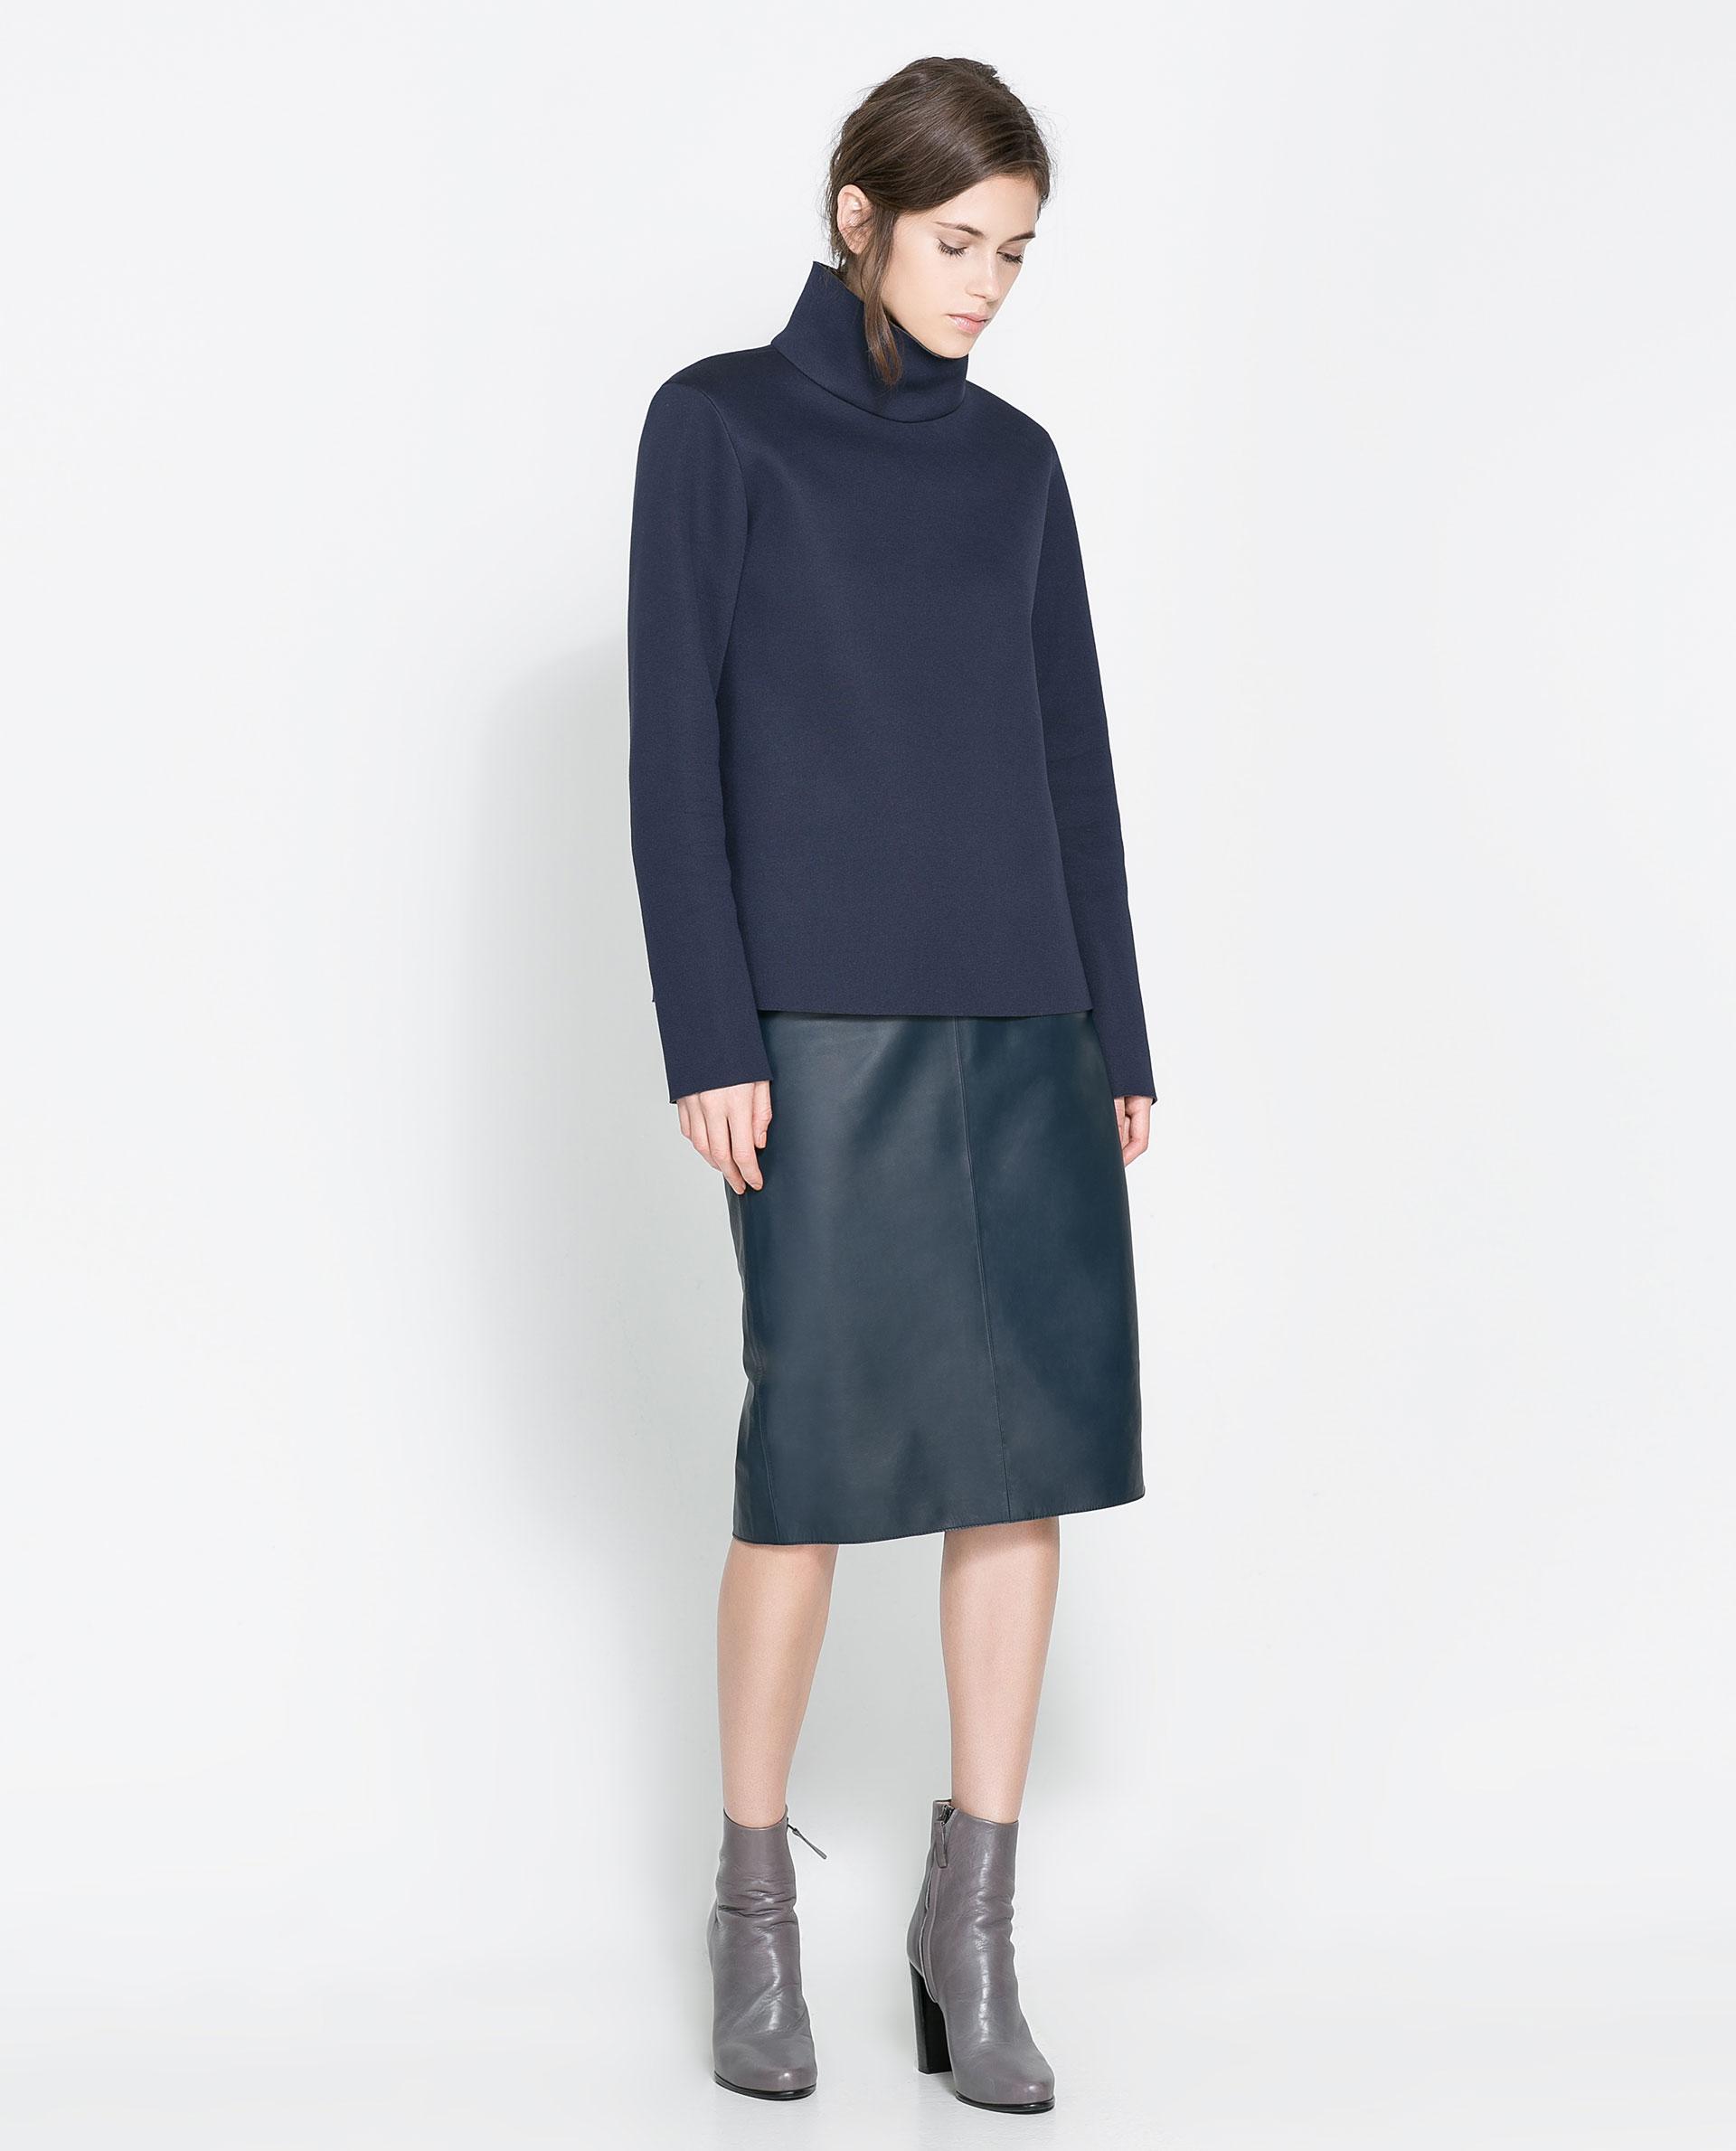 Skirts - Dress Ala - Part 63